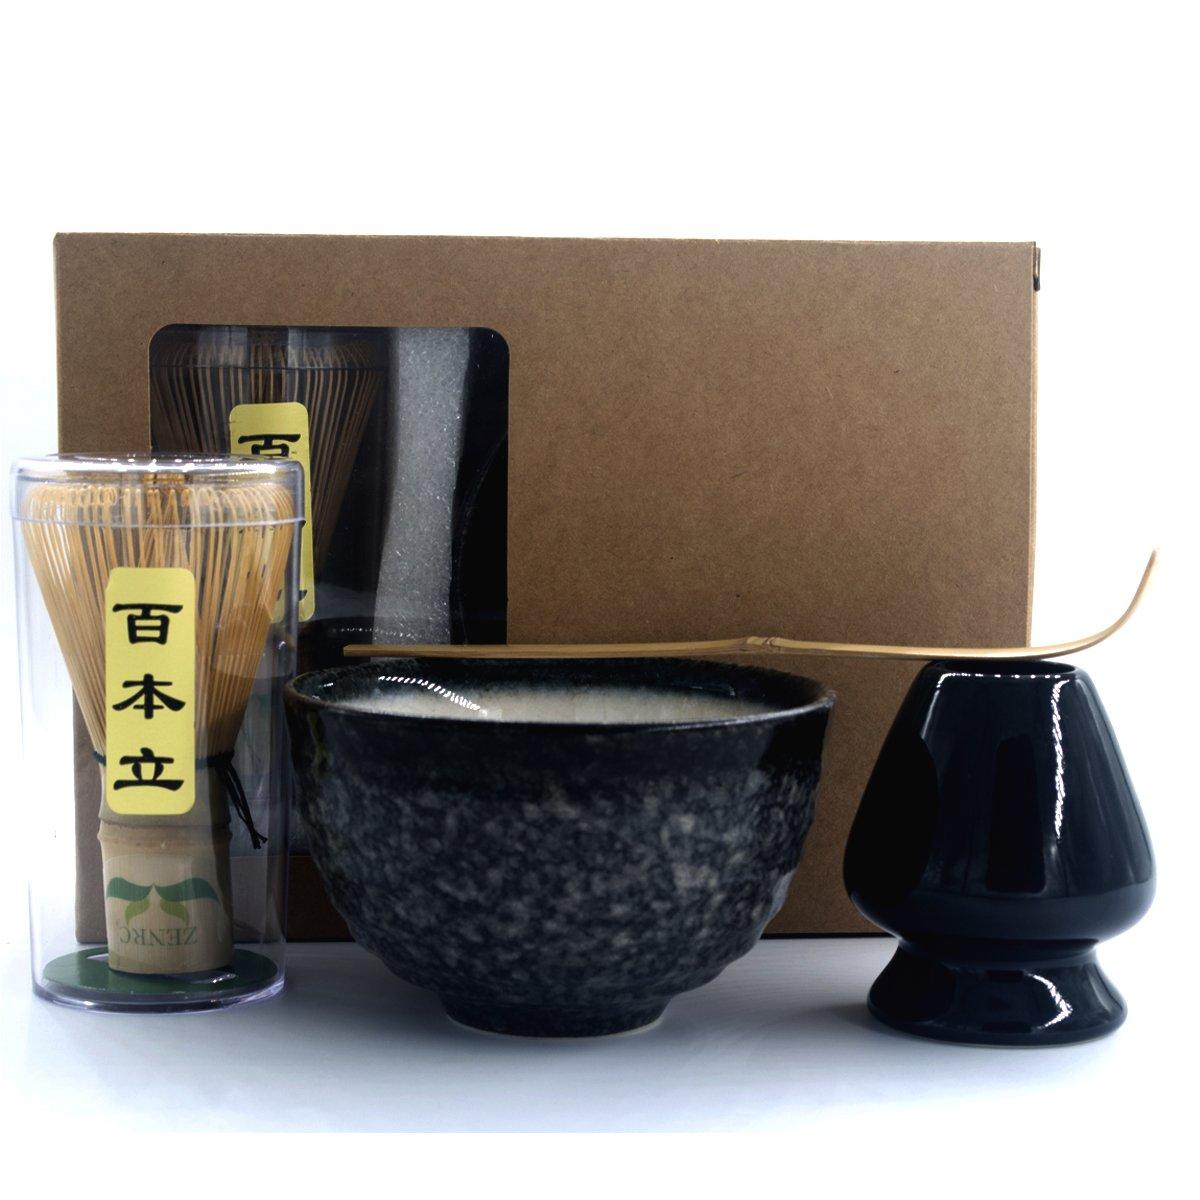 Complete Start Up Matcha Tea Kit - Retro Japanese Natural Bamboo Matcha Whisk ( Chasen ) - Scoop - Matcha Bowl - Whisk Holder - Ceremony Matcha tea Sets (Black cloud, 4 PCS)